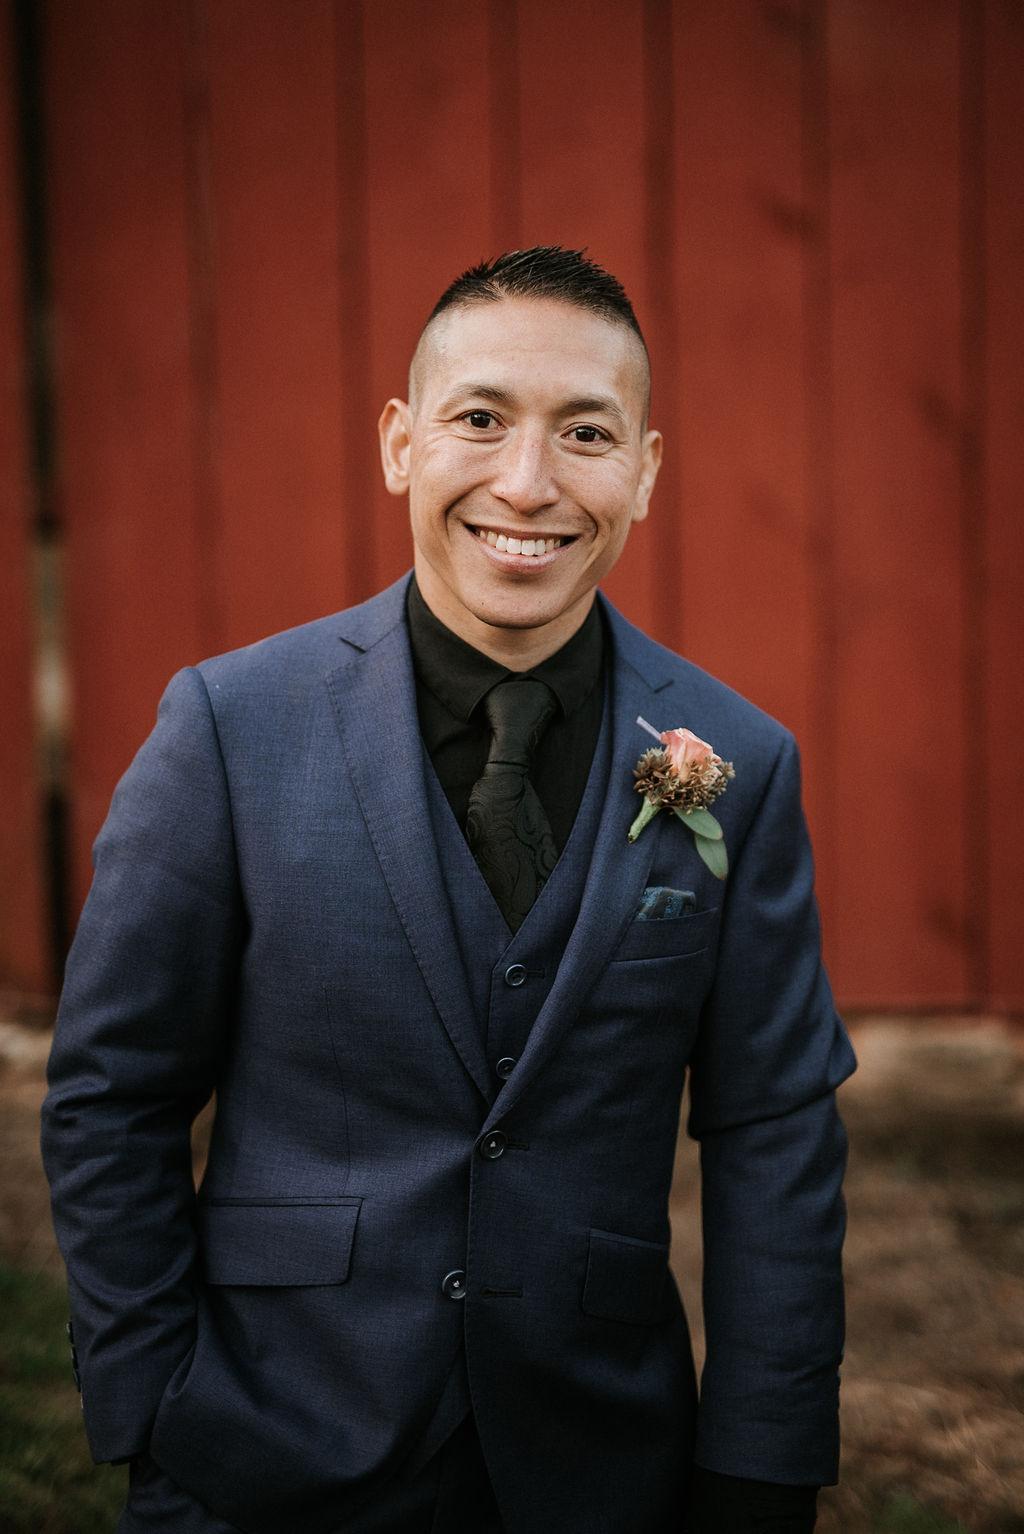 portrait of groom at kimble farm